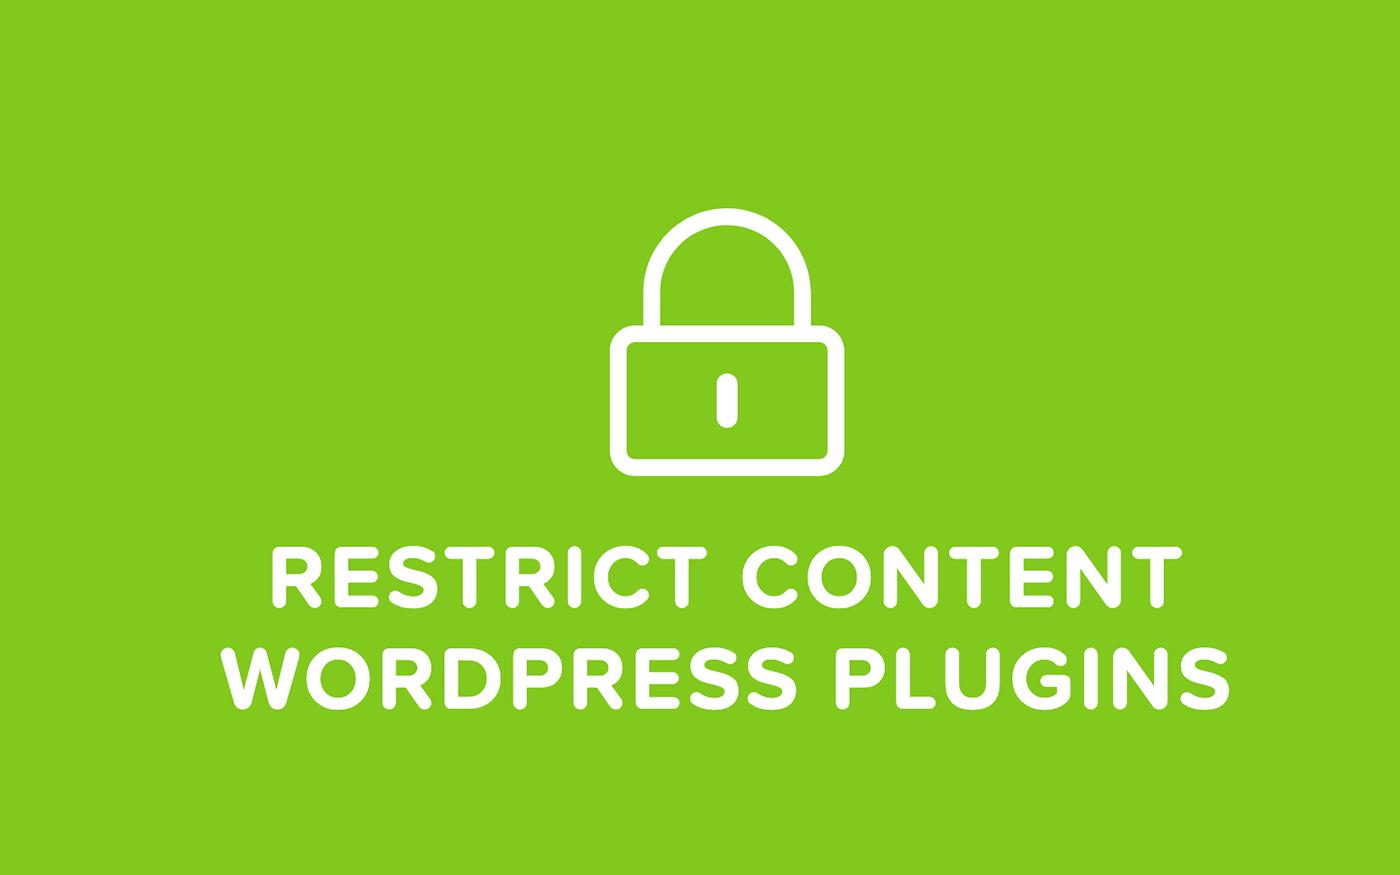 Top 5 Restrict Content WordPress Plugins For Membership Site